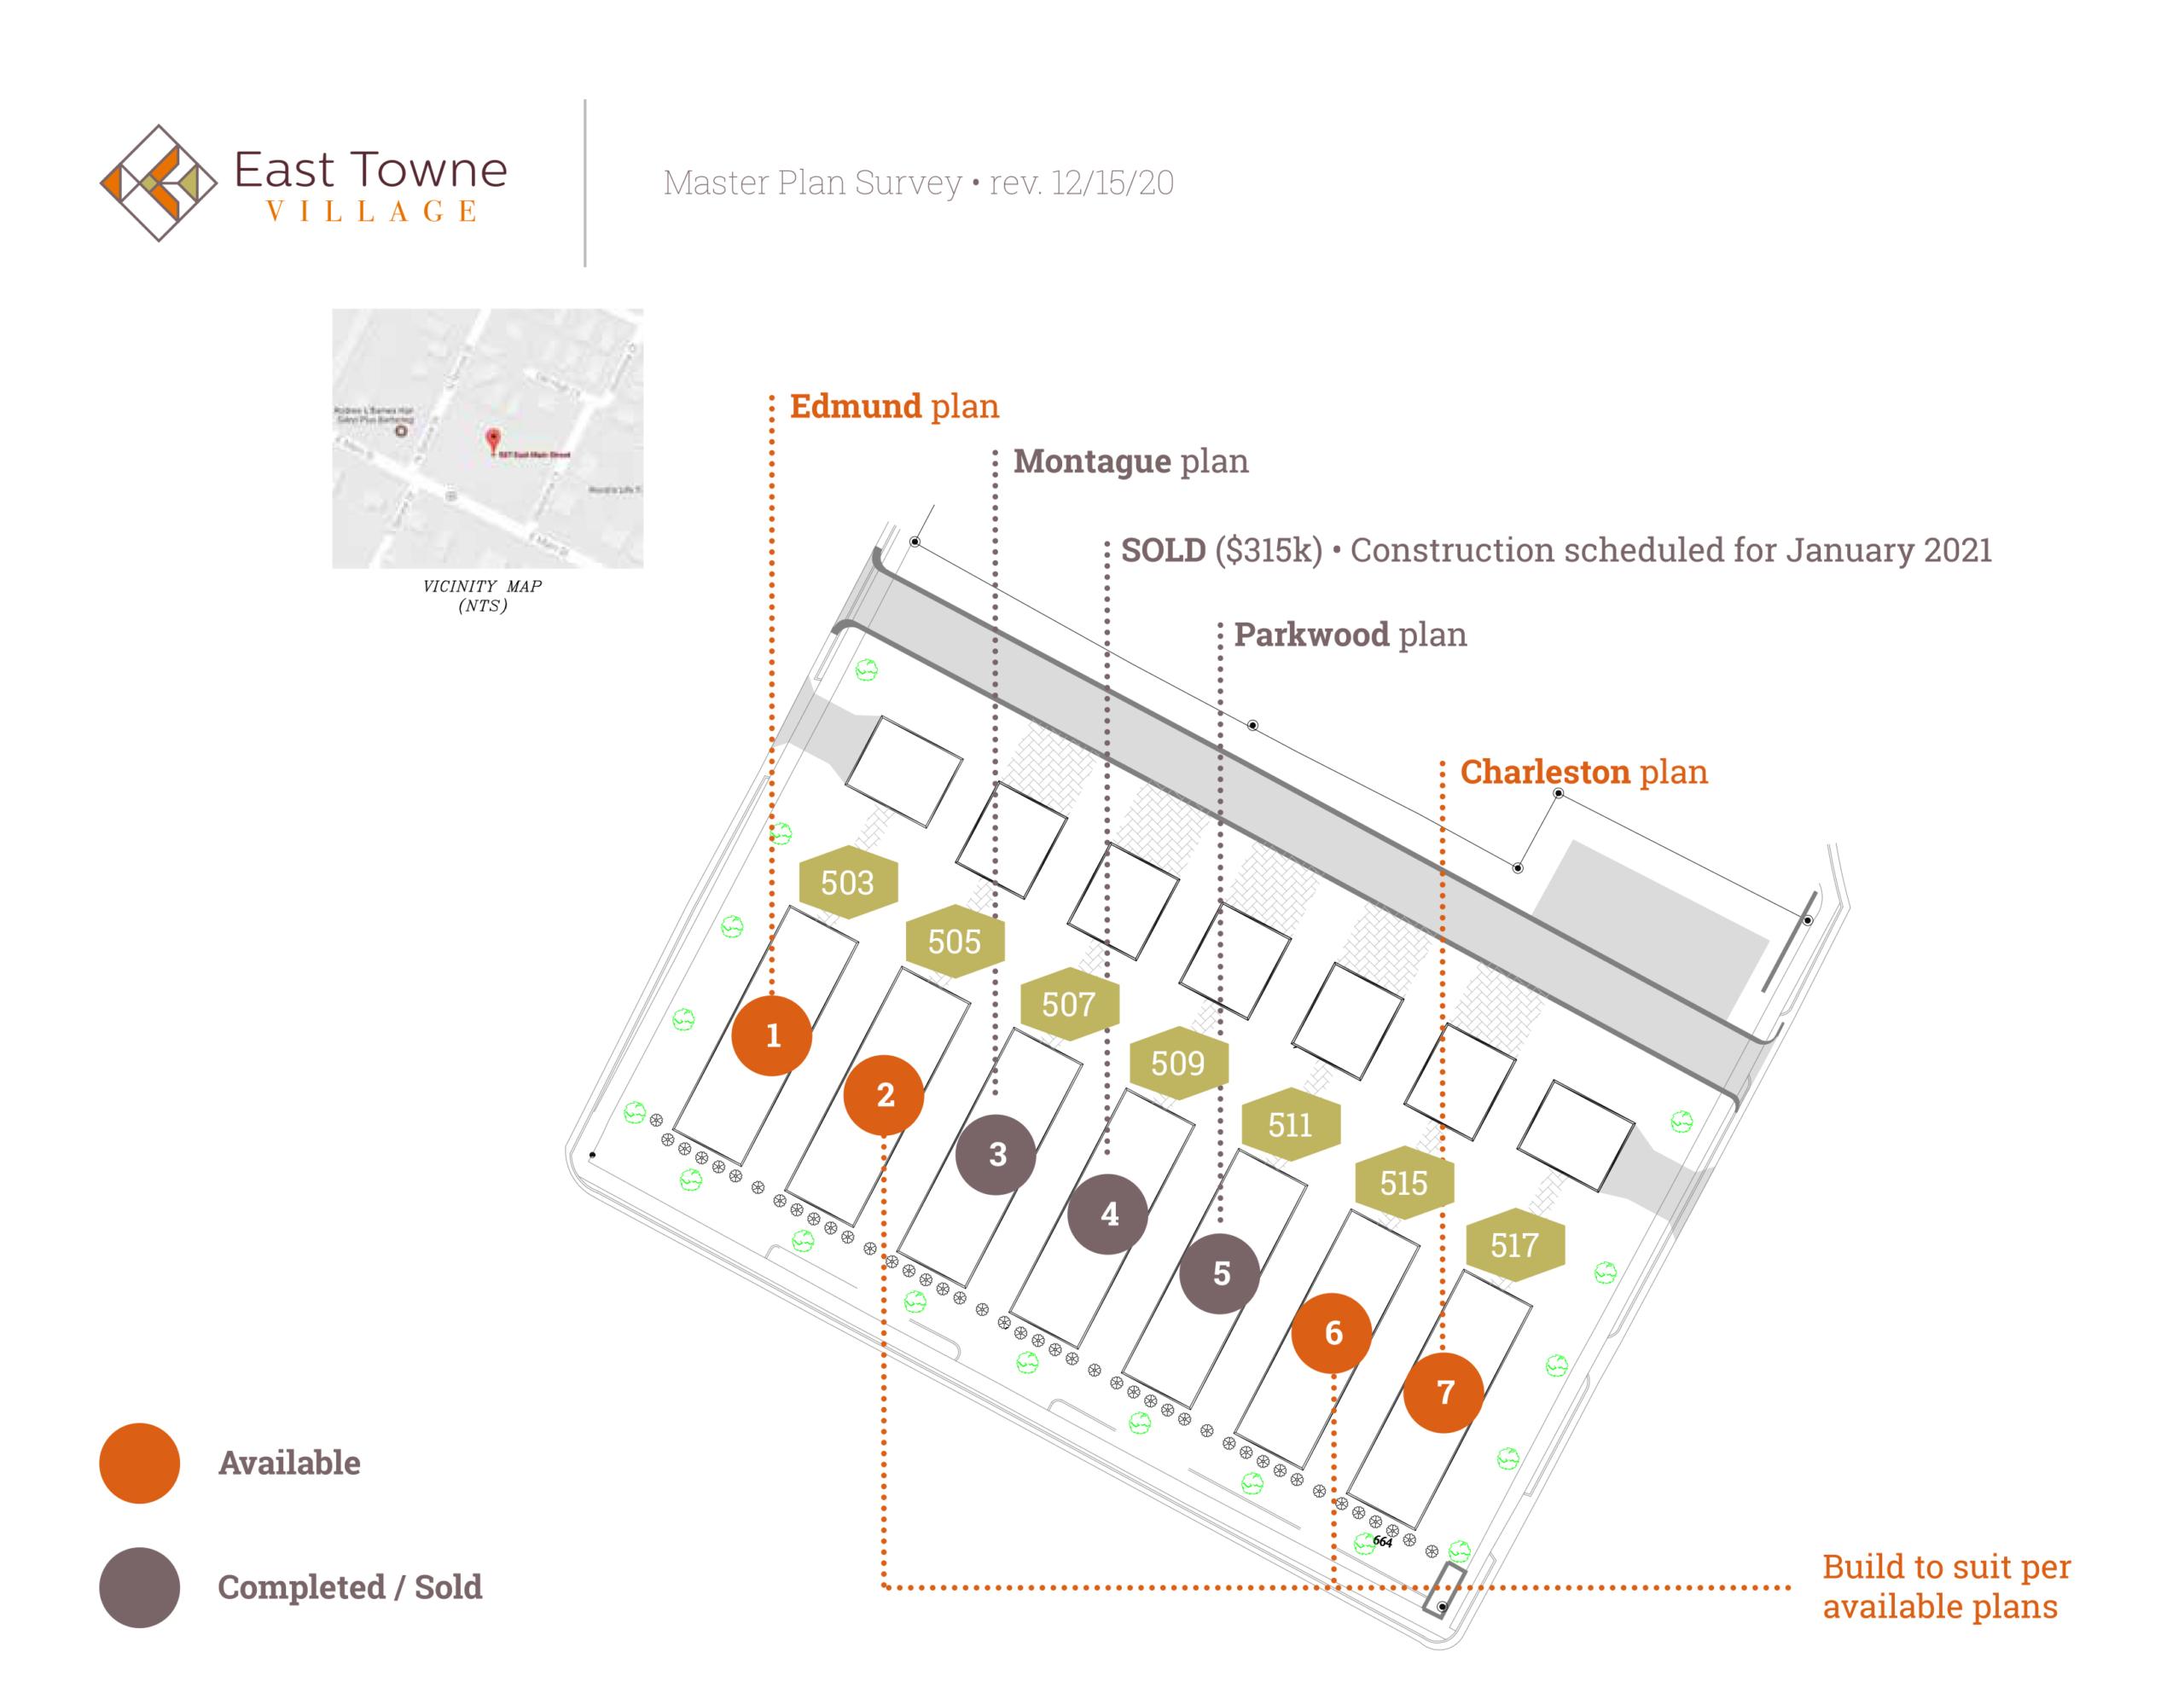 East Towne Village Rock Hill SC Lot Map 12/2020